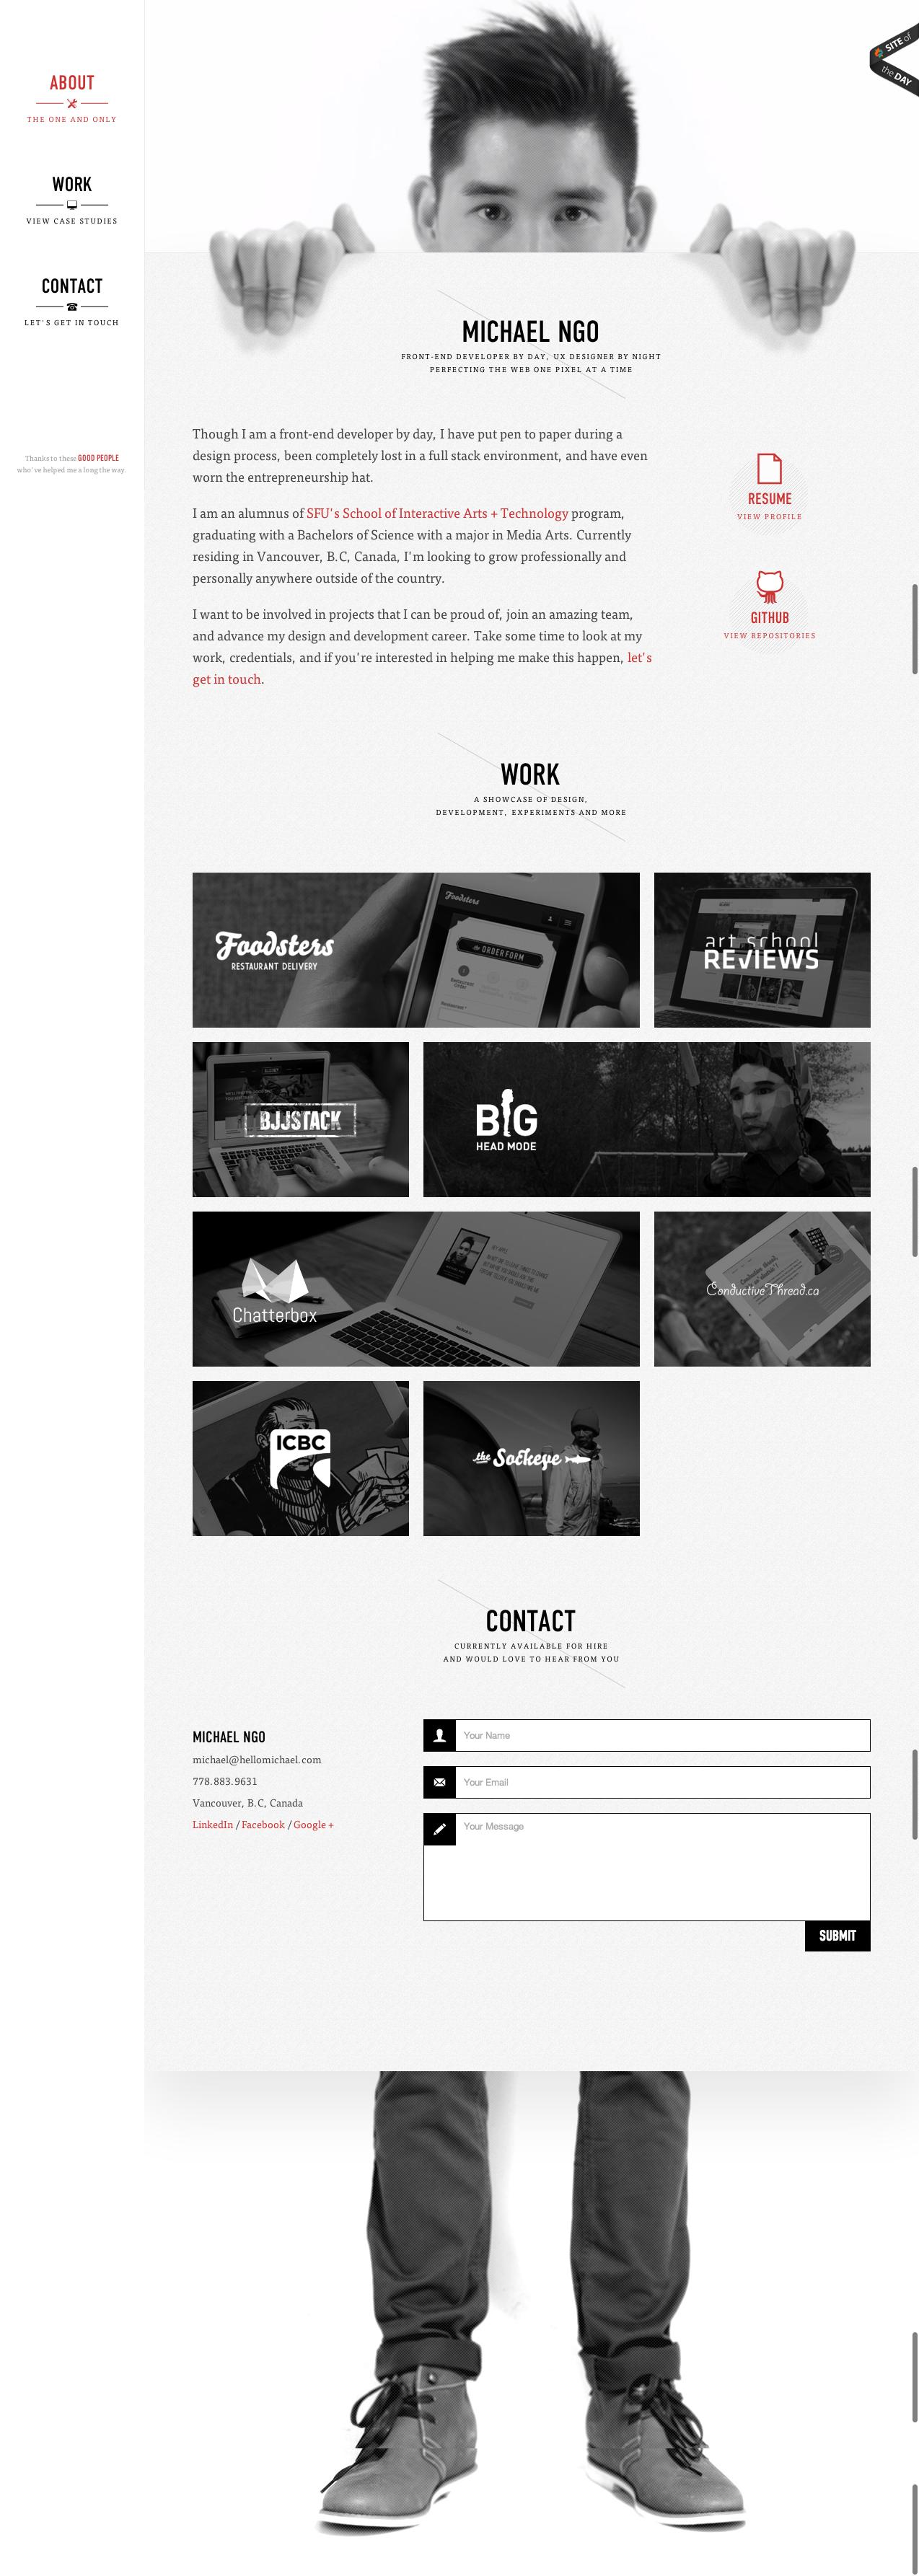 Screenshot - Web Design | Design: UI/UX. Apps. Websites | Michael Ngo |